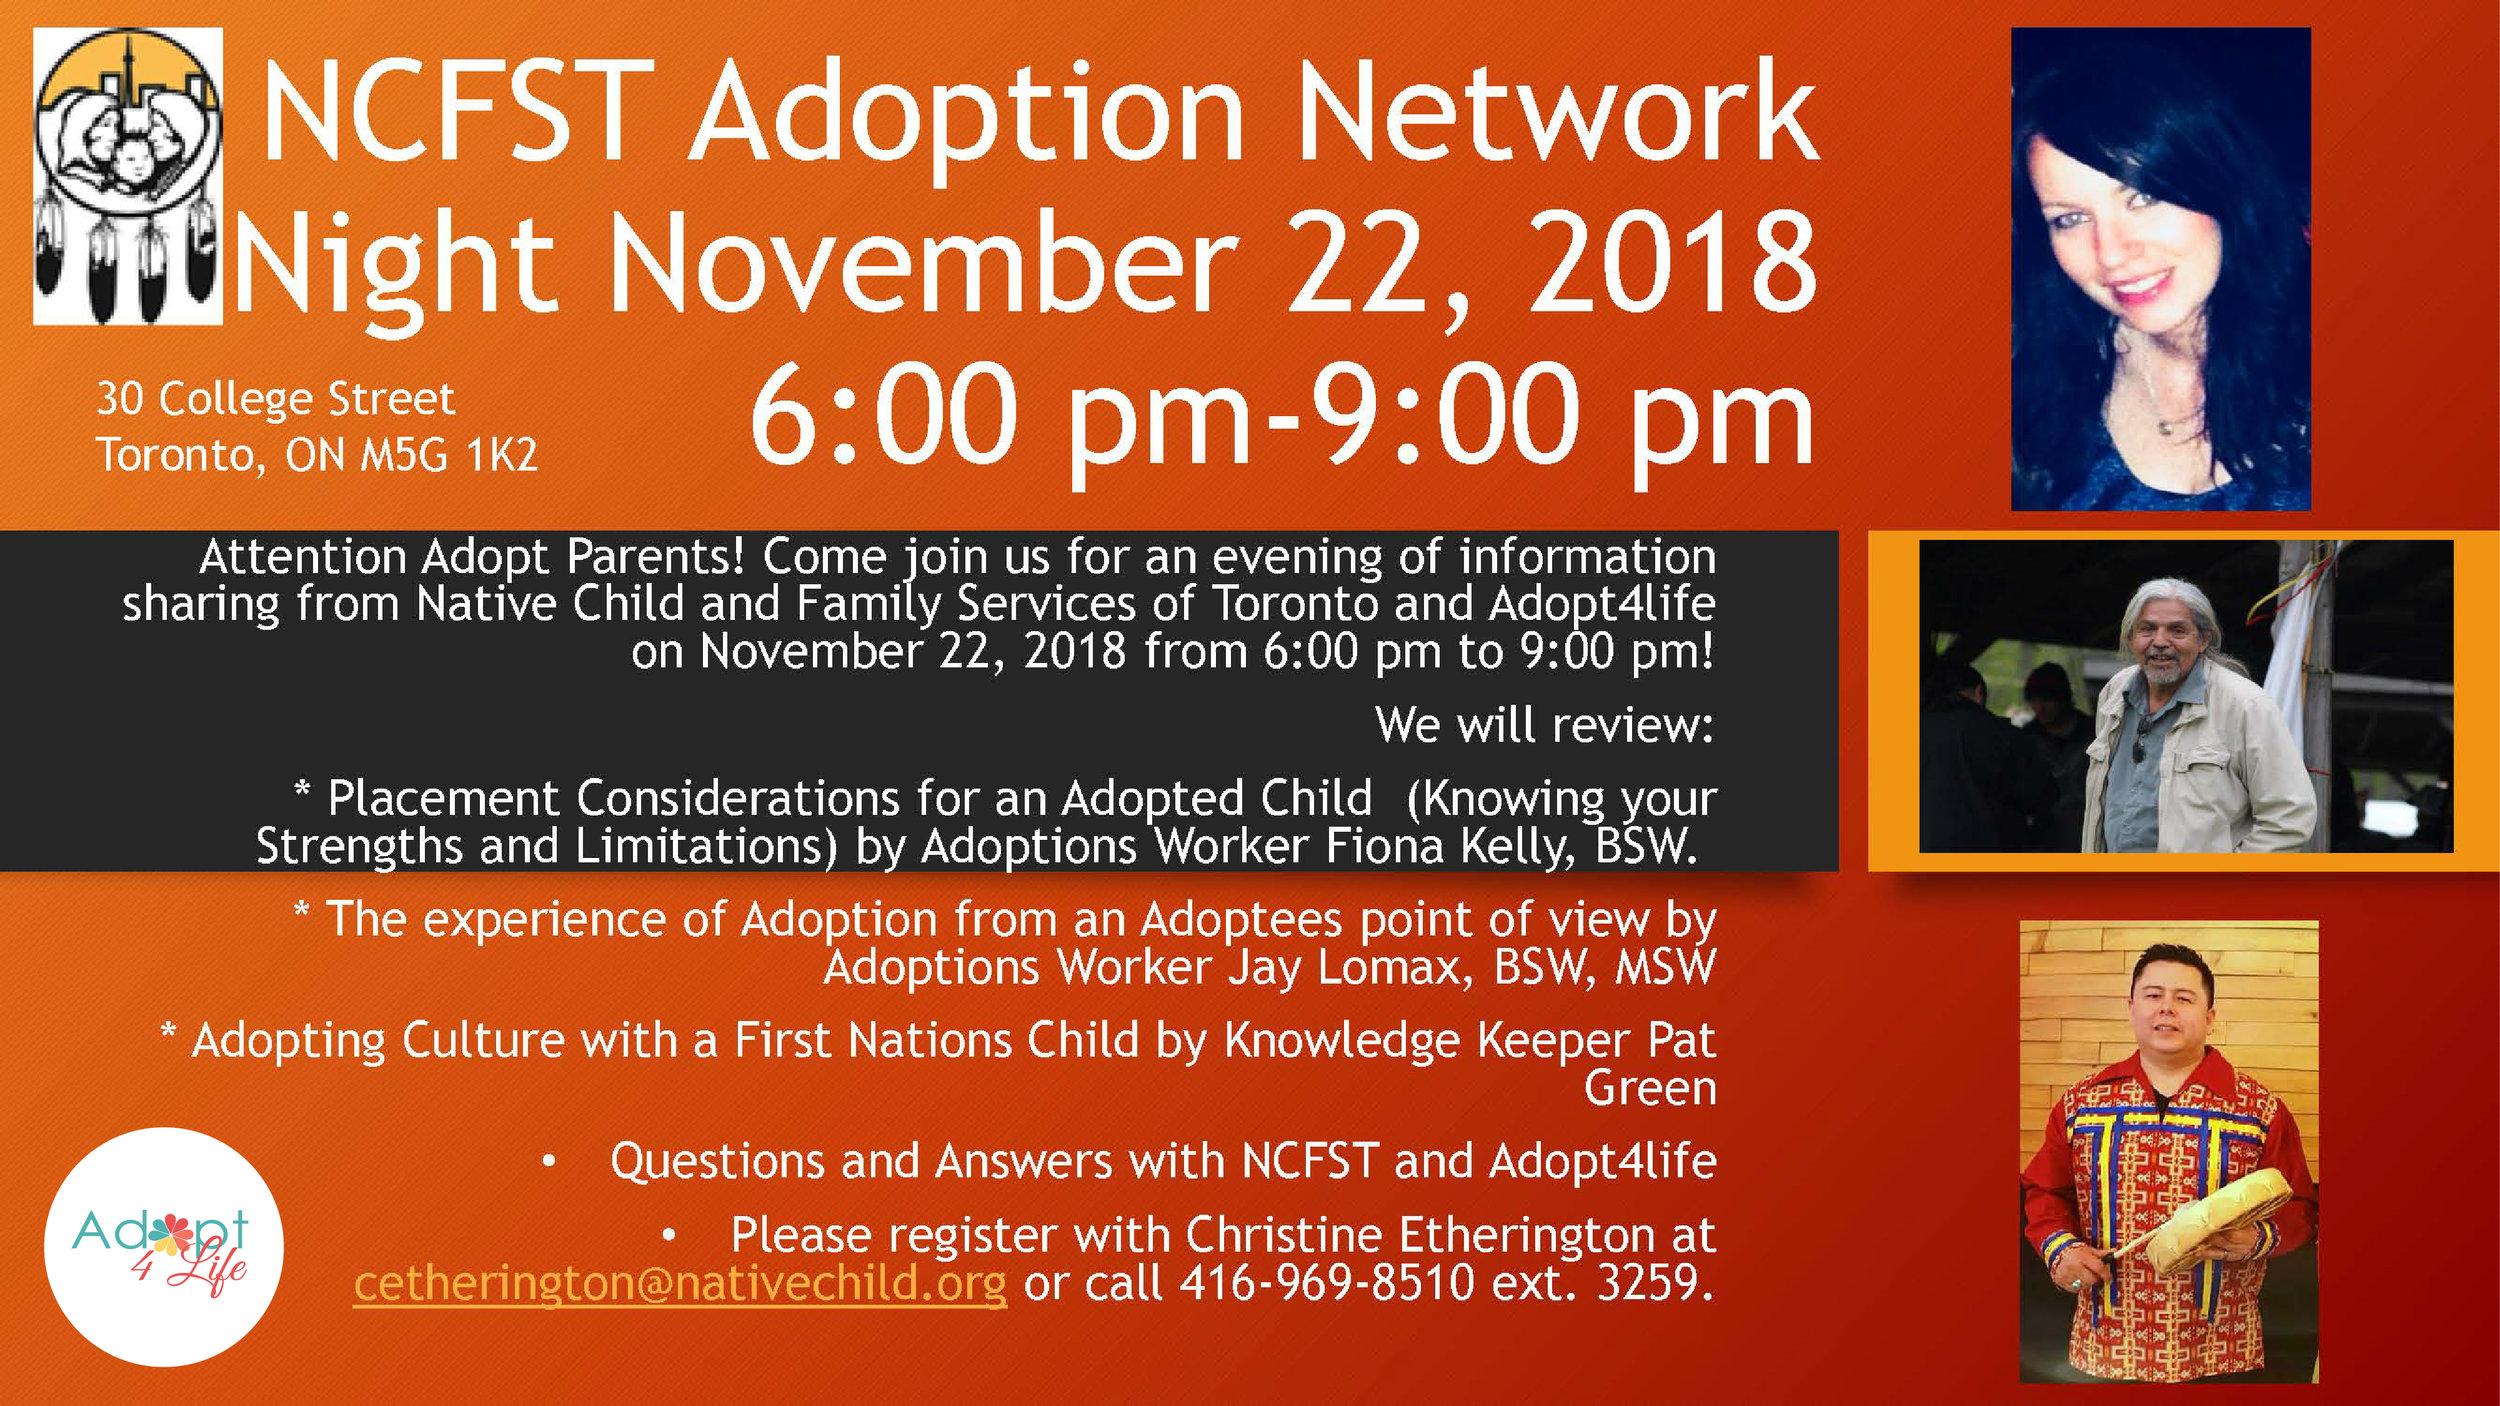 NCFST_Adoption_Network_Night_November_2018_Page_1.jpg